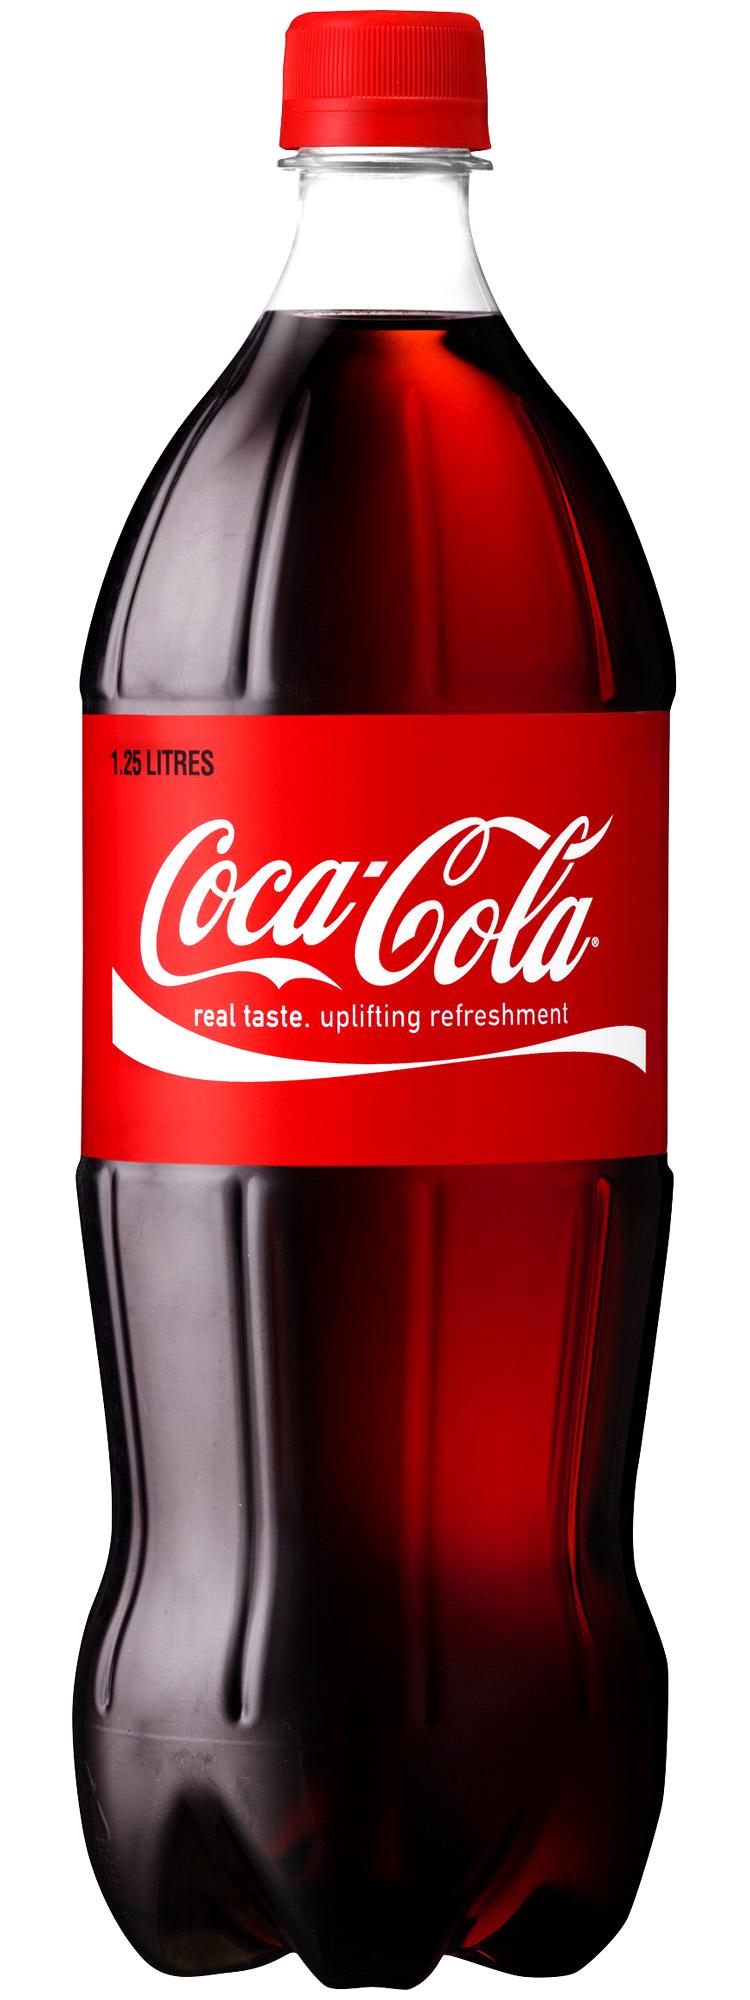 Image download free. Coca cola bottle png